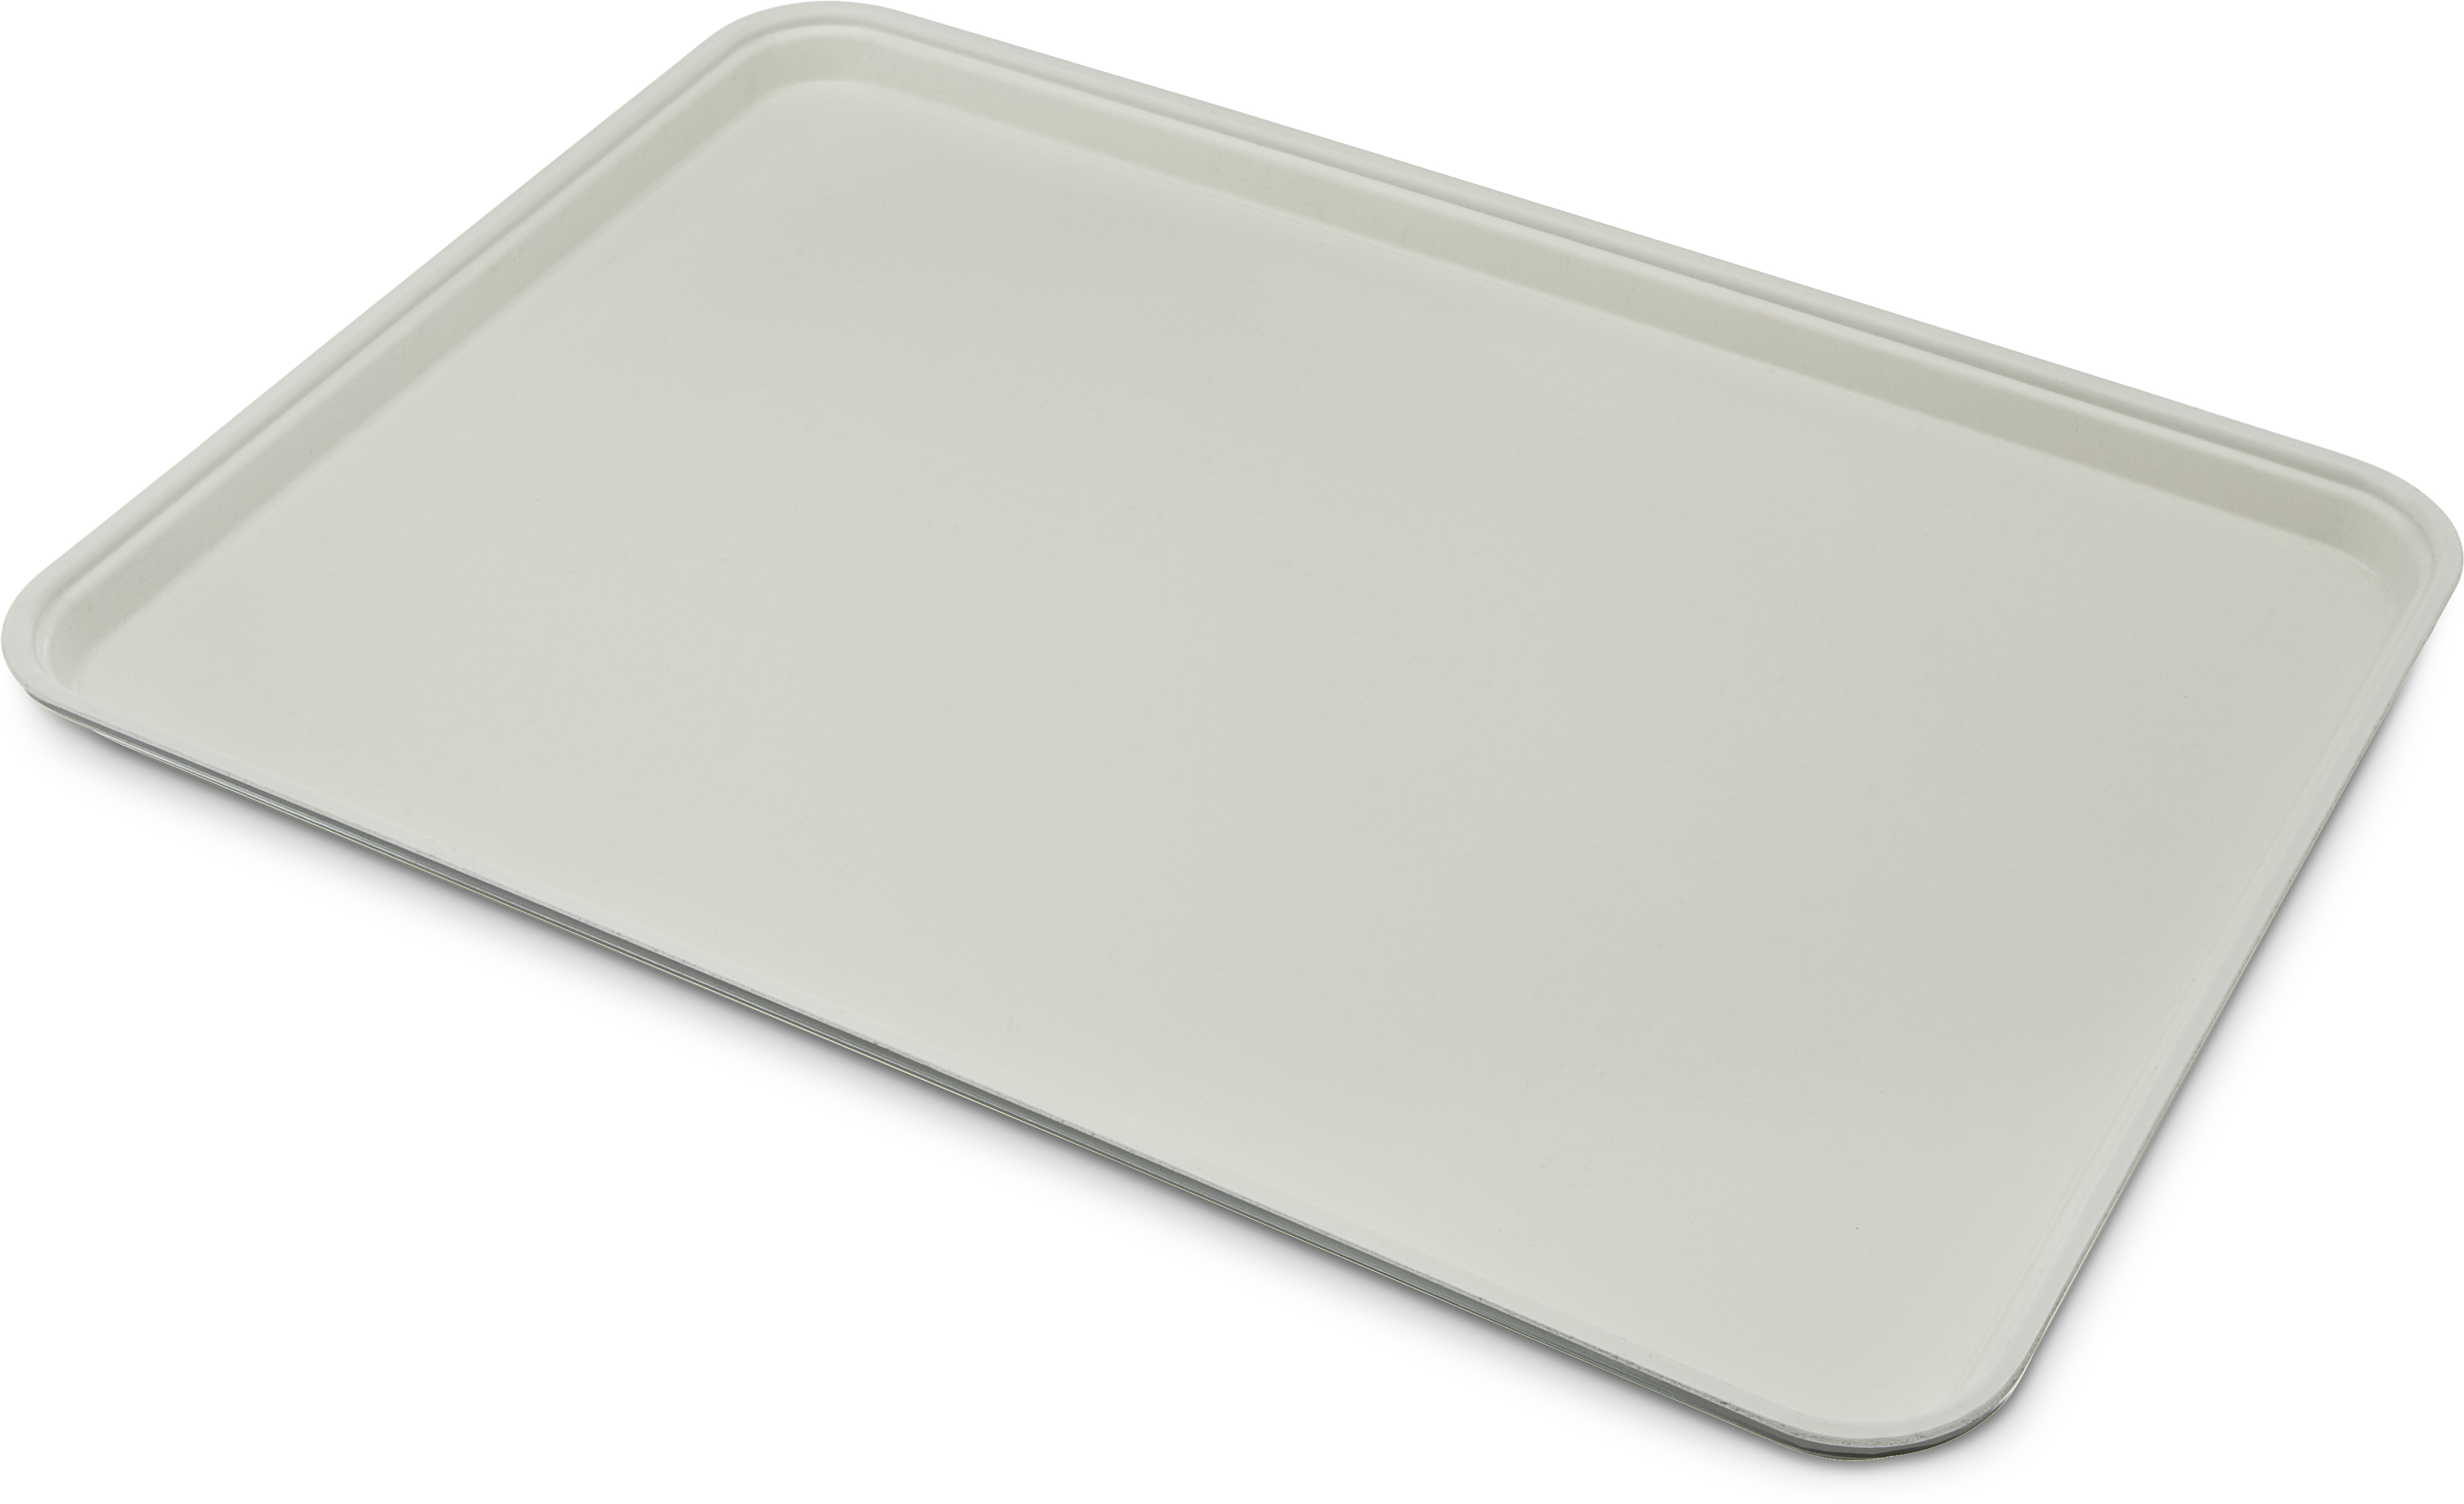 Glasteel Tray Display/Bakery 17.9 x 25.6 - Smoke Gray